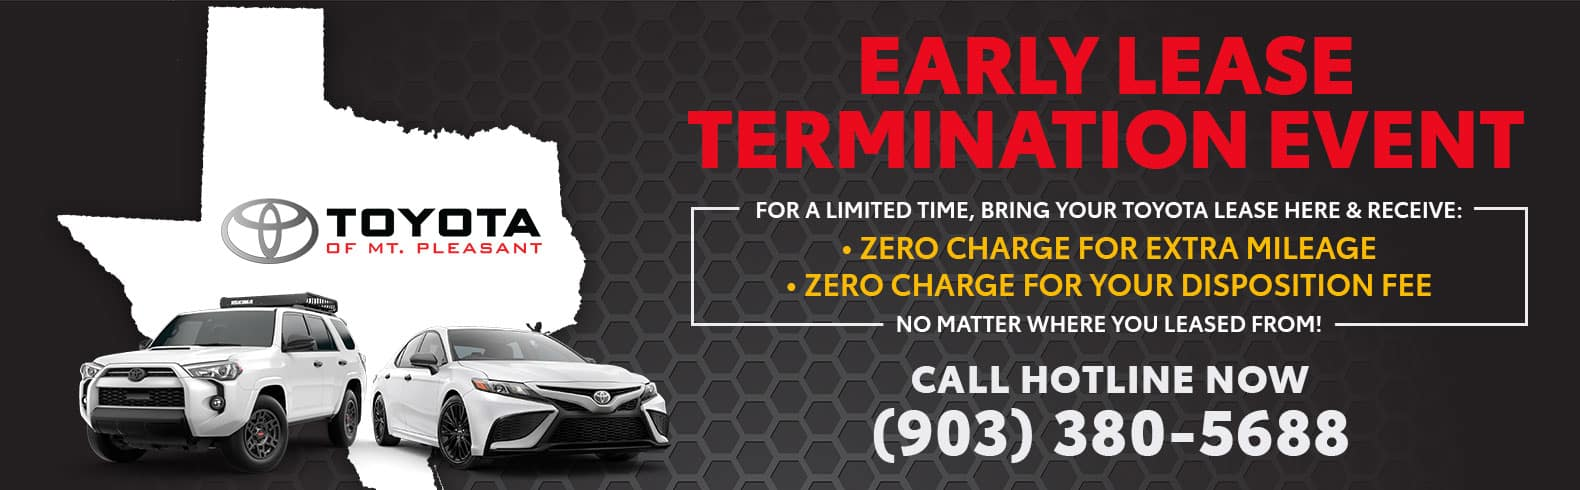 Lease Termination Event in Mt. Pleasant, TX